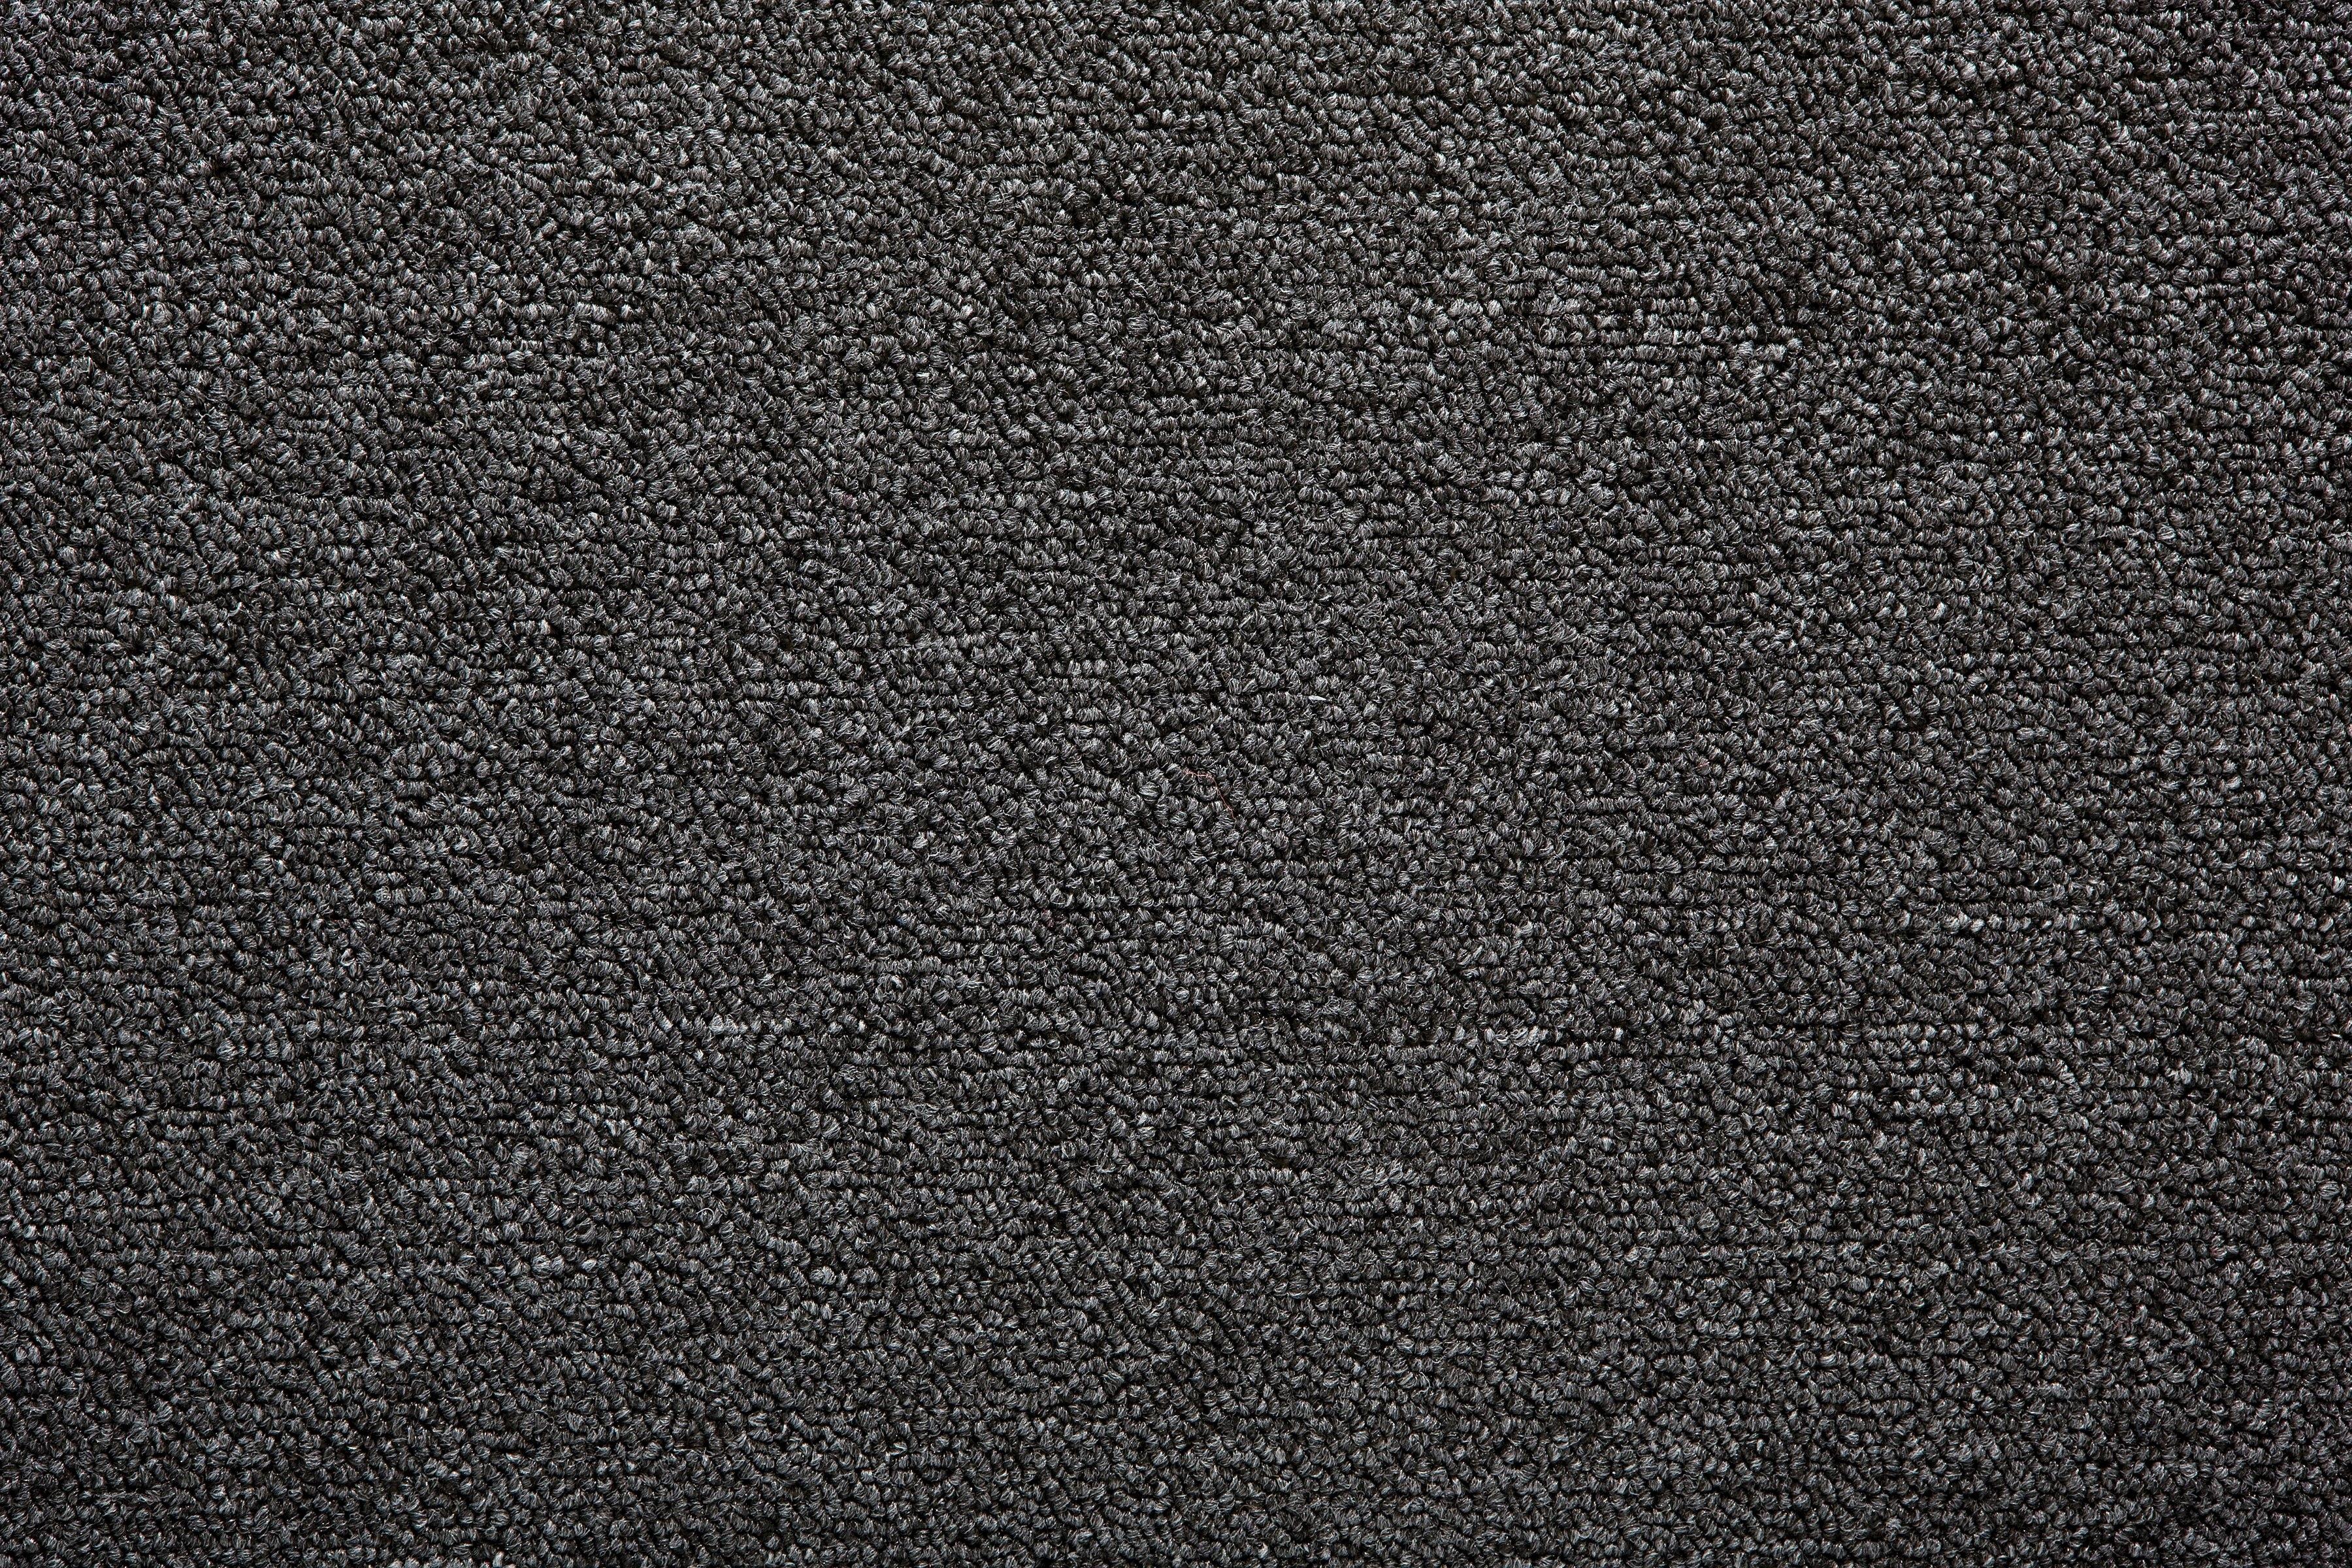 Andiamo tapijt »Bob Festmaß 5x4m«, breedte 500 cm, Festmaß 500x400 cm - gratis ruilen op otto.nl